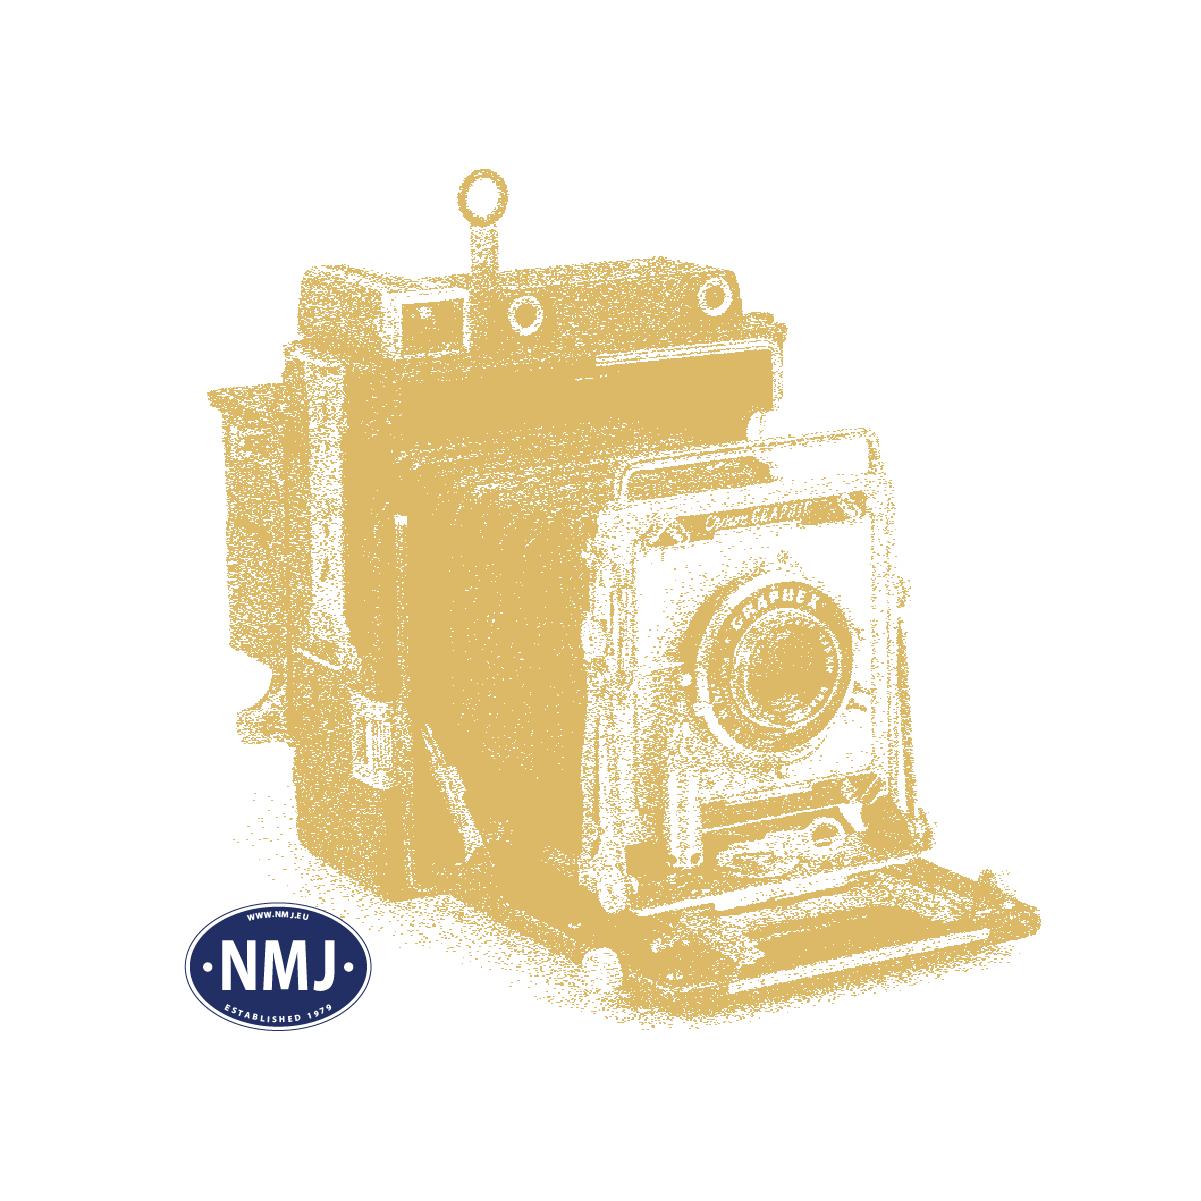 MBR50-6005 - Eikeblader, Sommer, 10 g